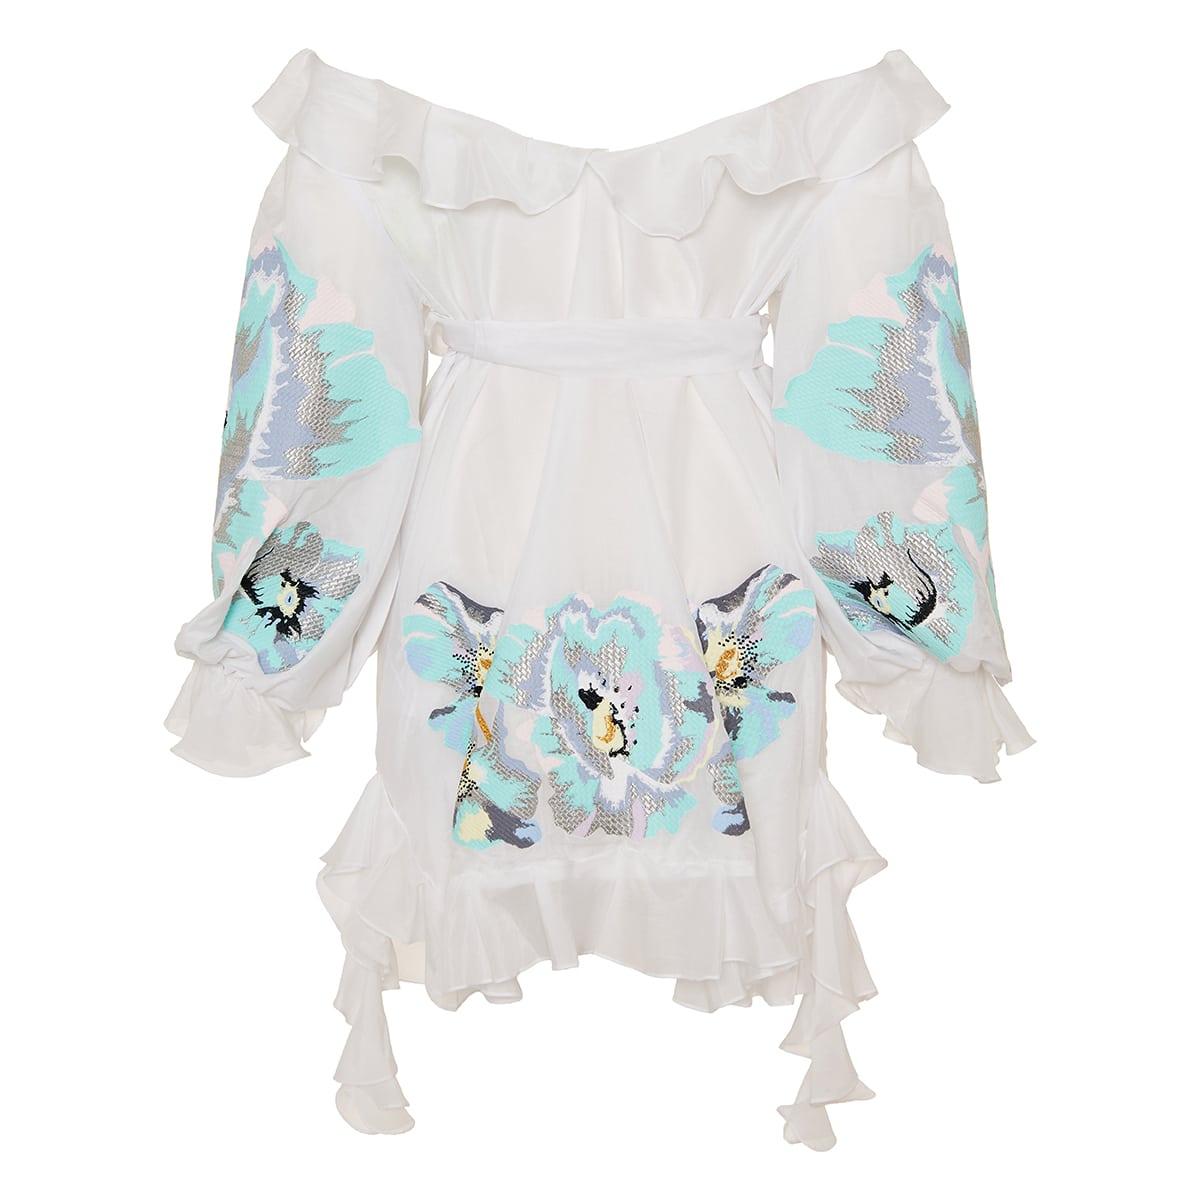 Exstasy off-the-shoulder embroidered mini dress